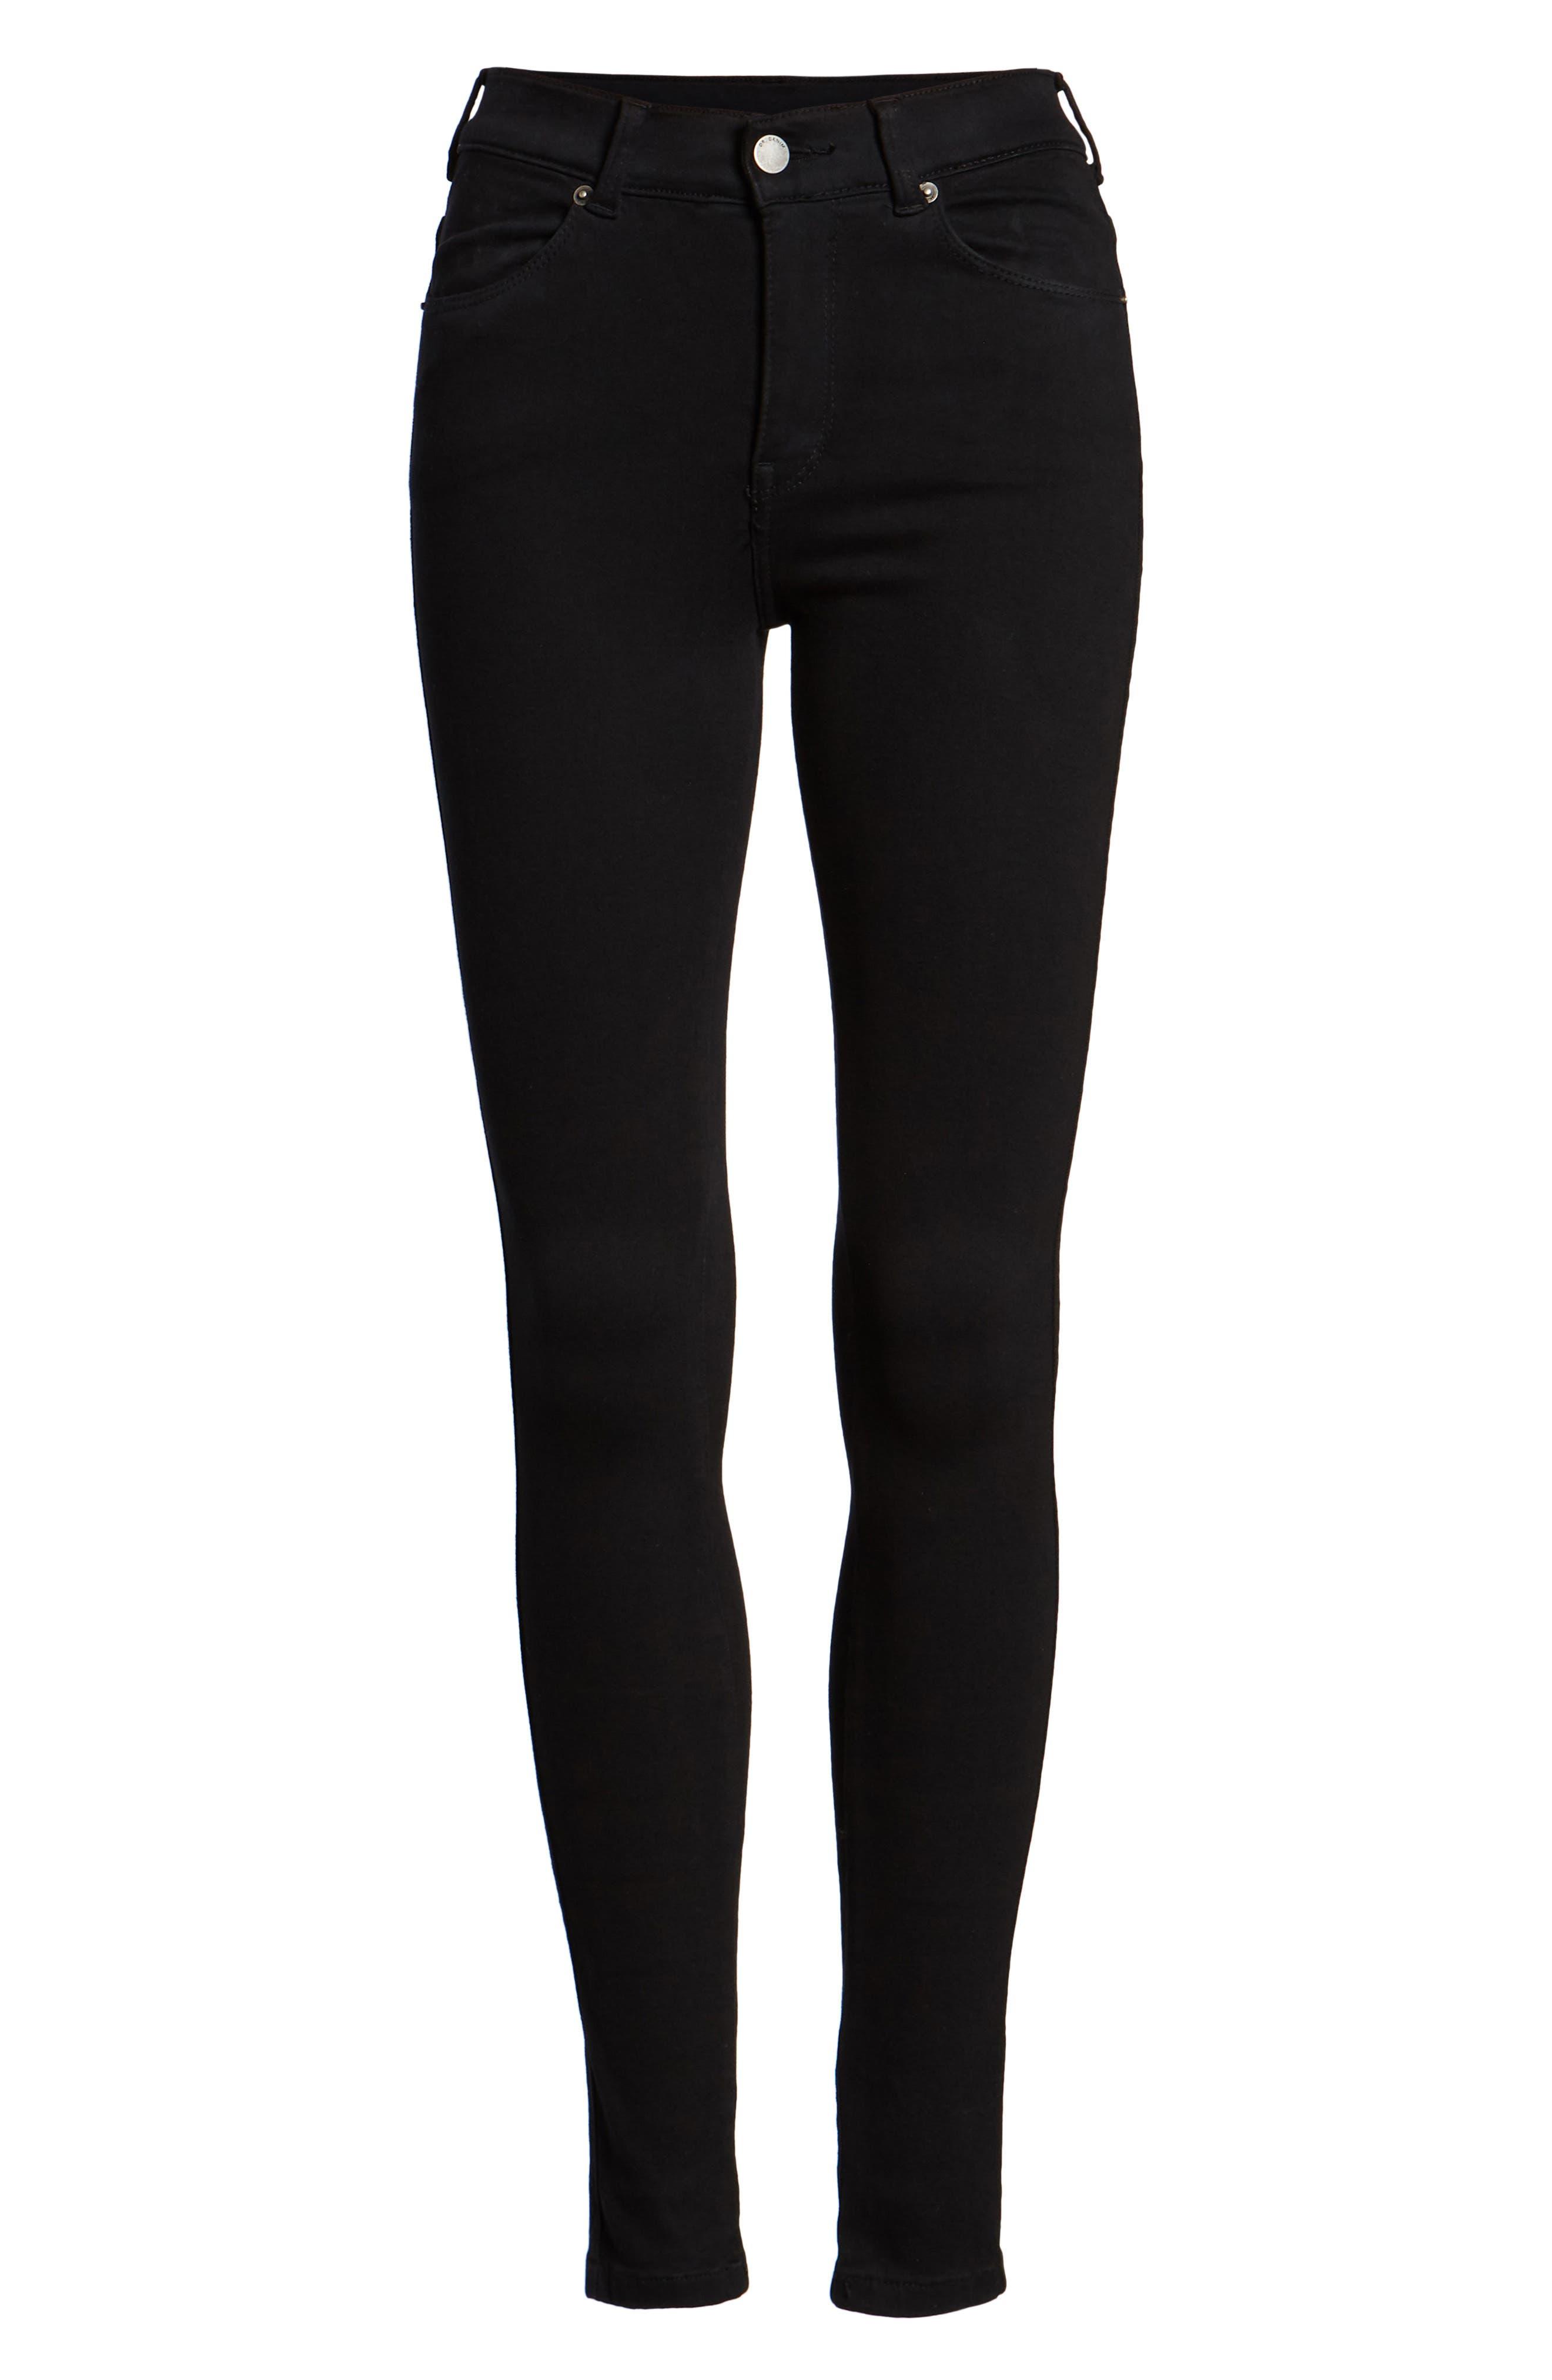 Lexy Skinny Jeans,                             Alternate thumbnail 7, color,                             Black